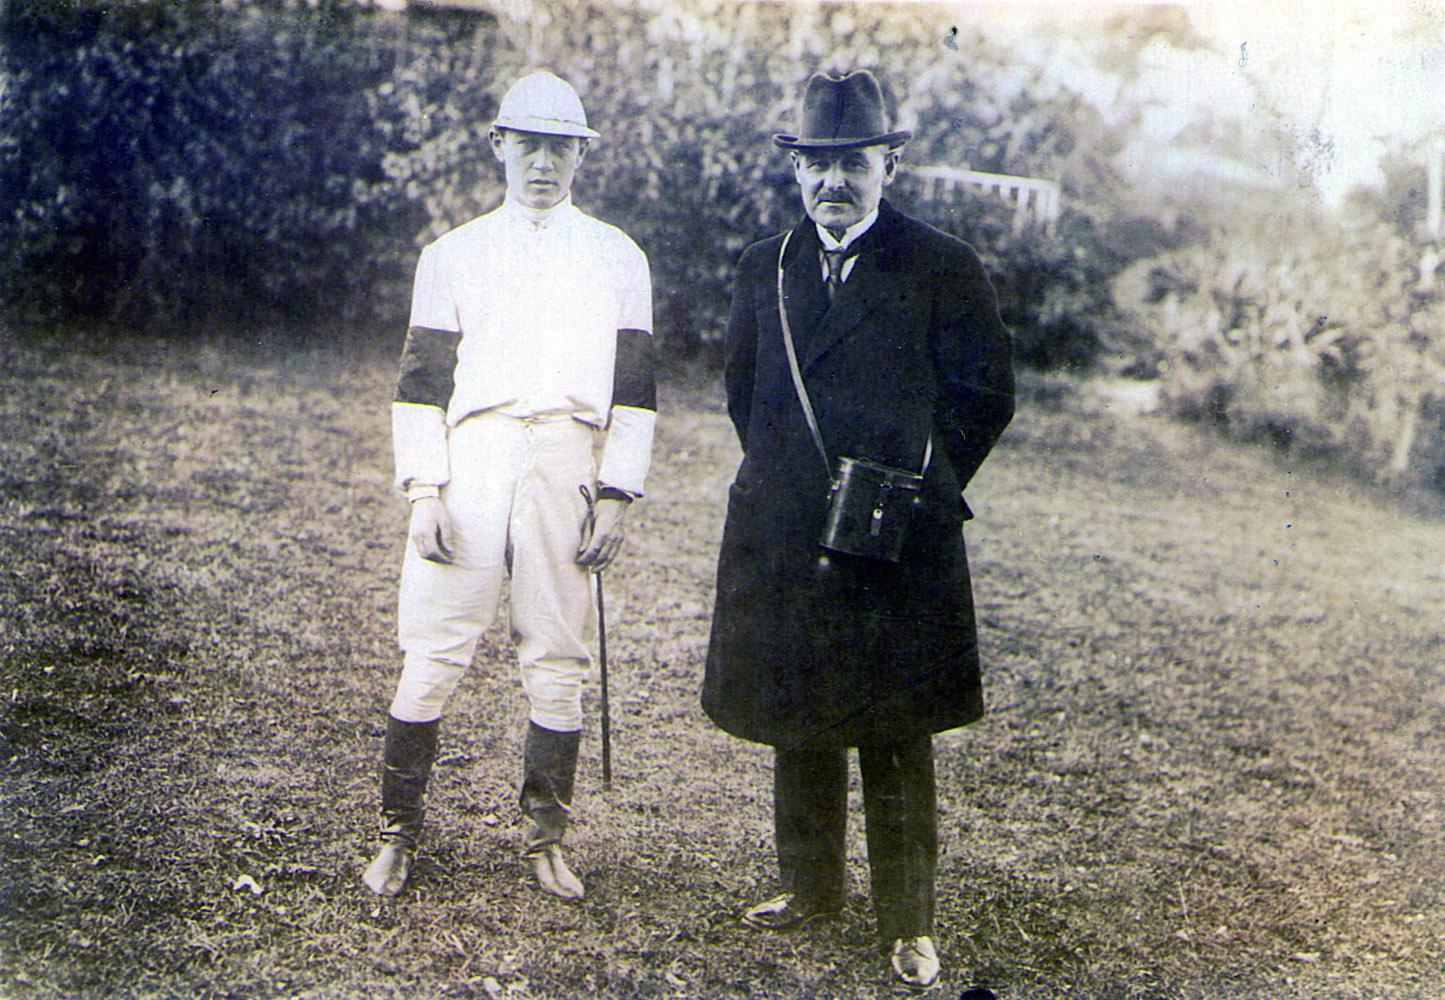 William Duke (right) (Museum Collection)